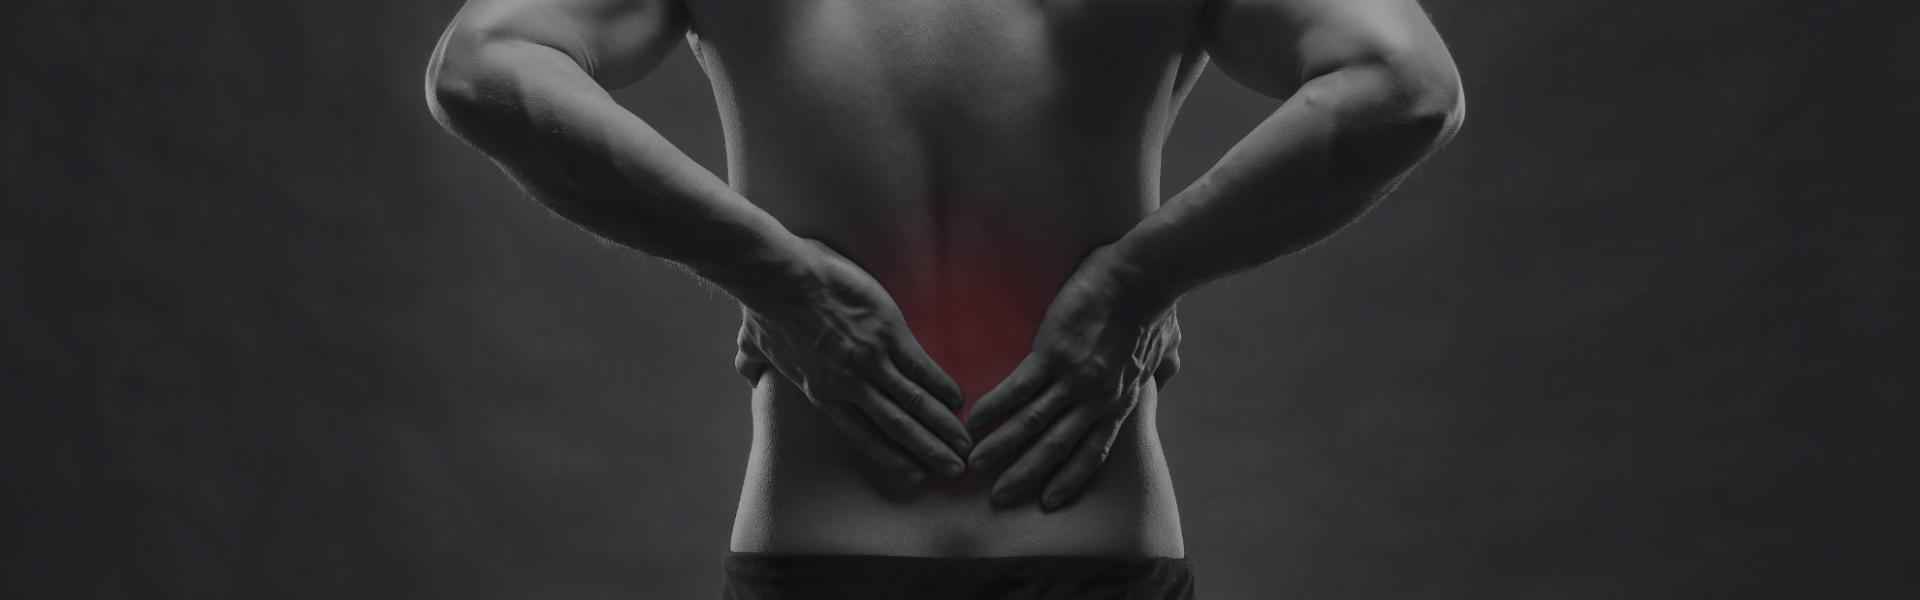 Chiropractor Malpractice Lawyer